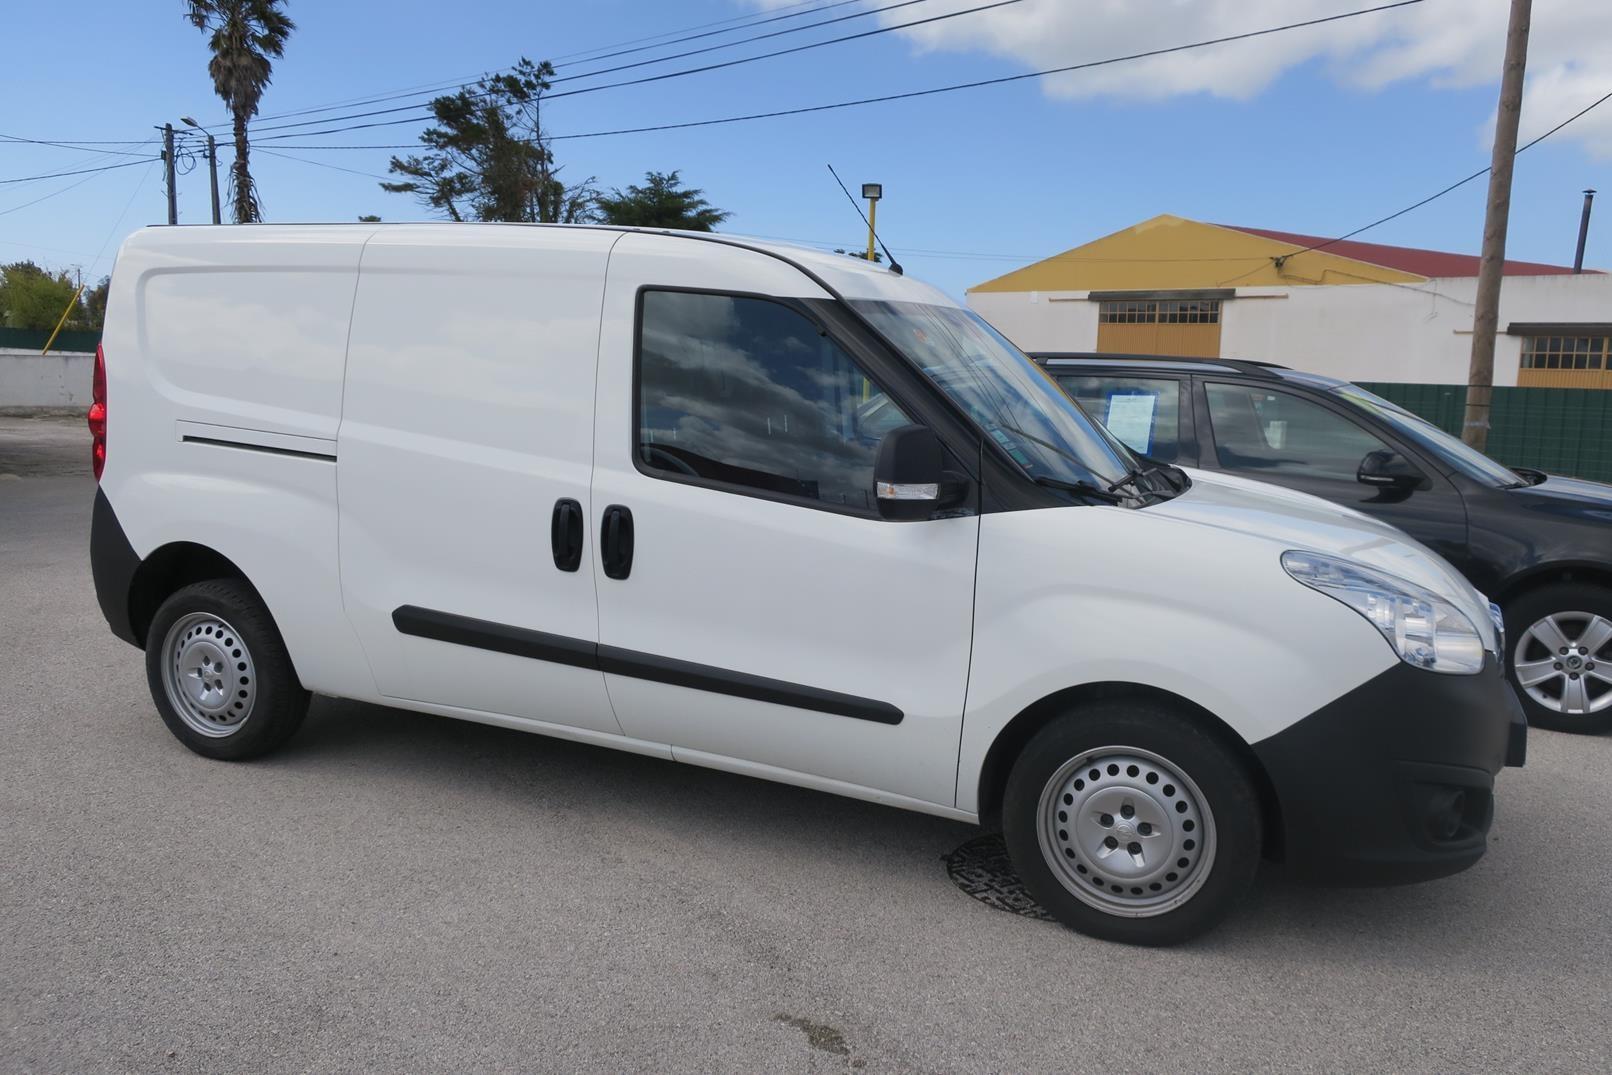 Opel Combo 1.6 CDTi L2H1 Maxi 105cv